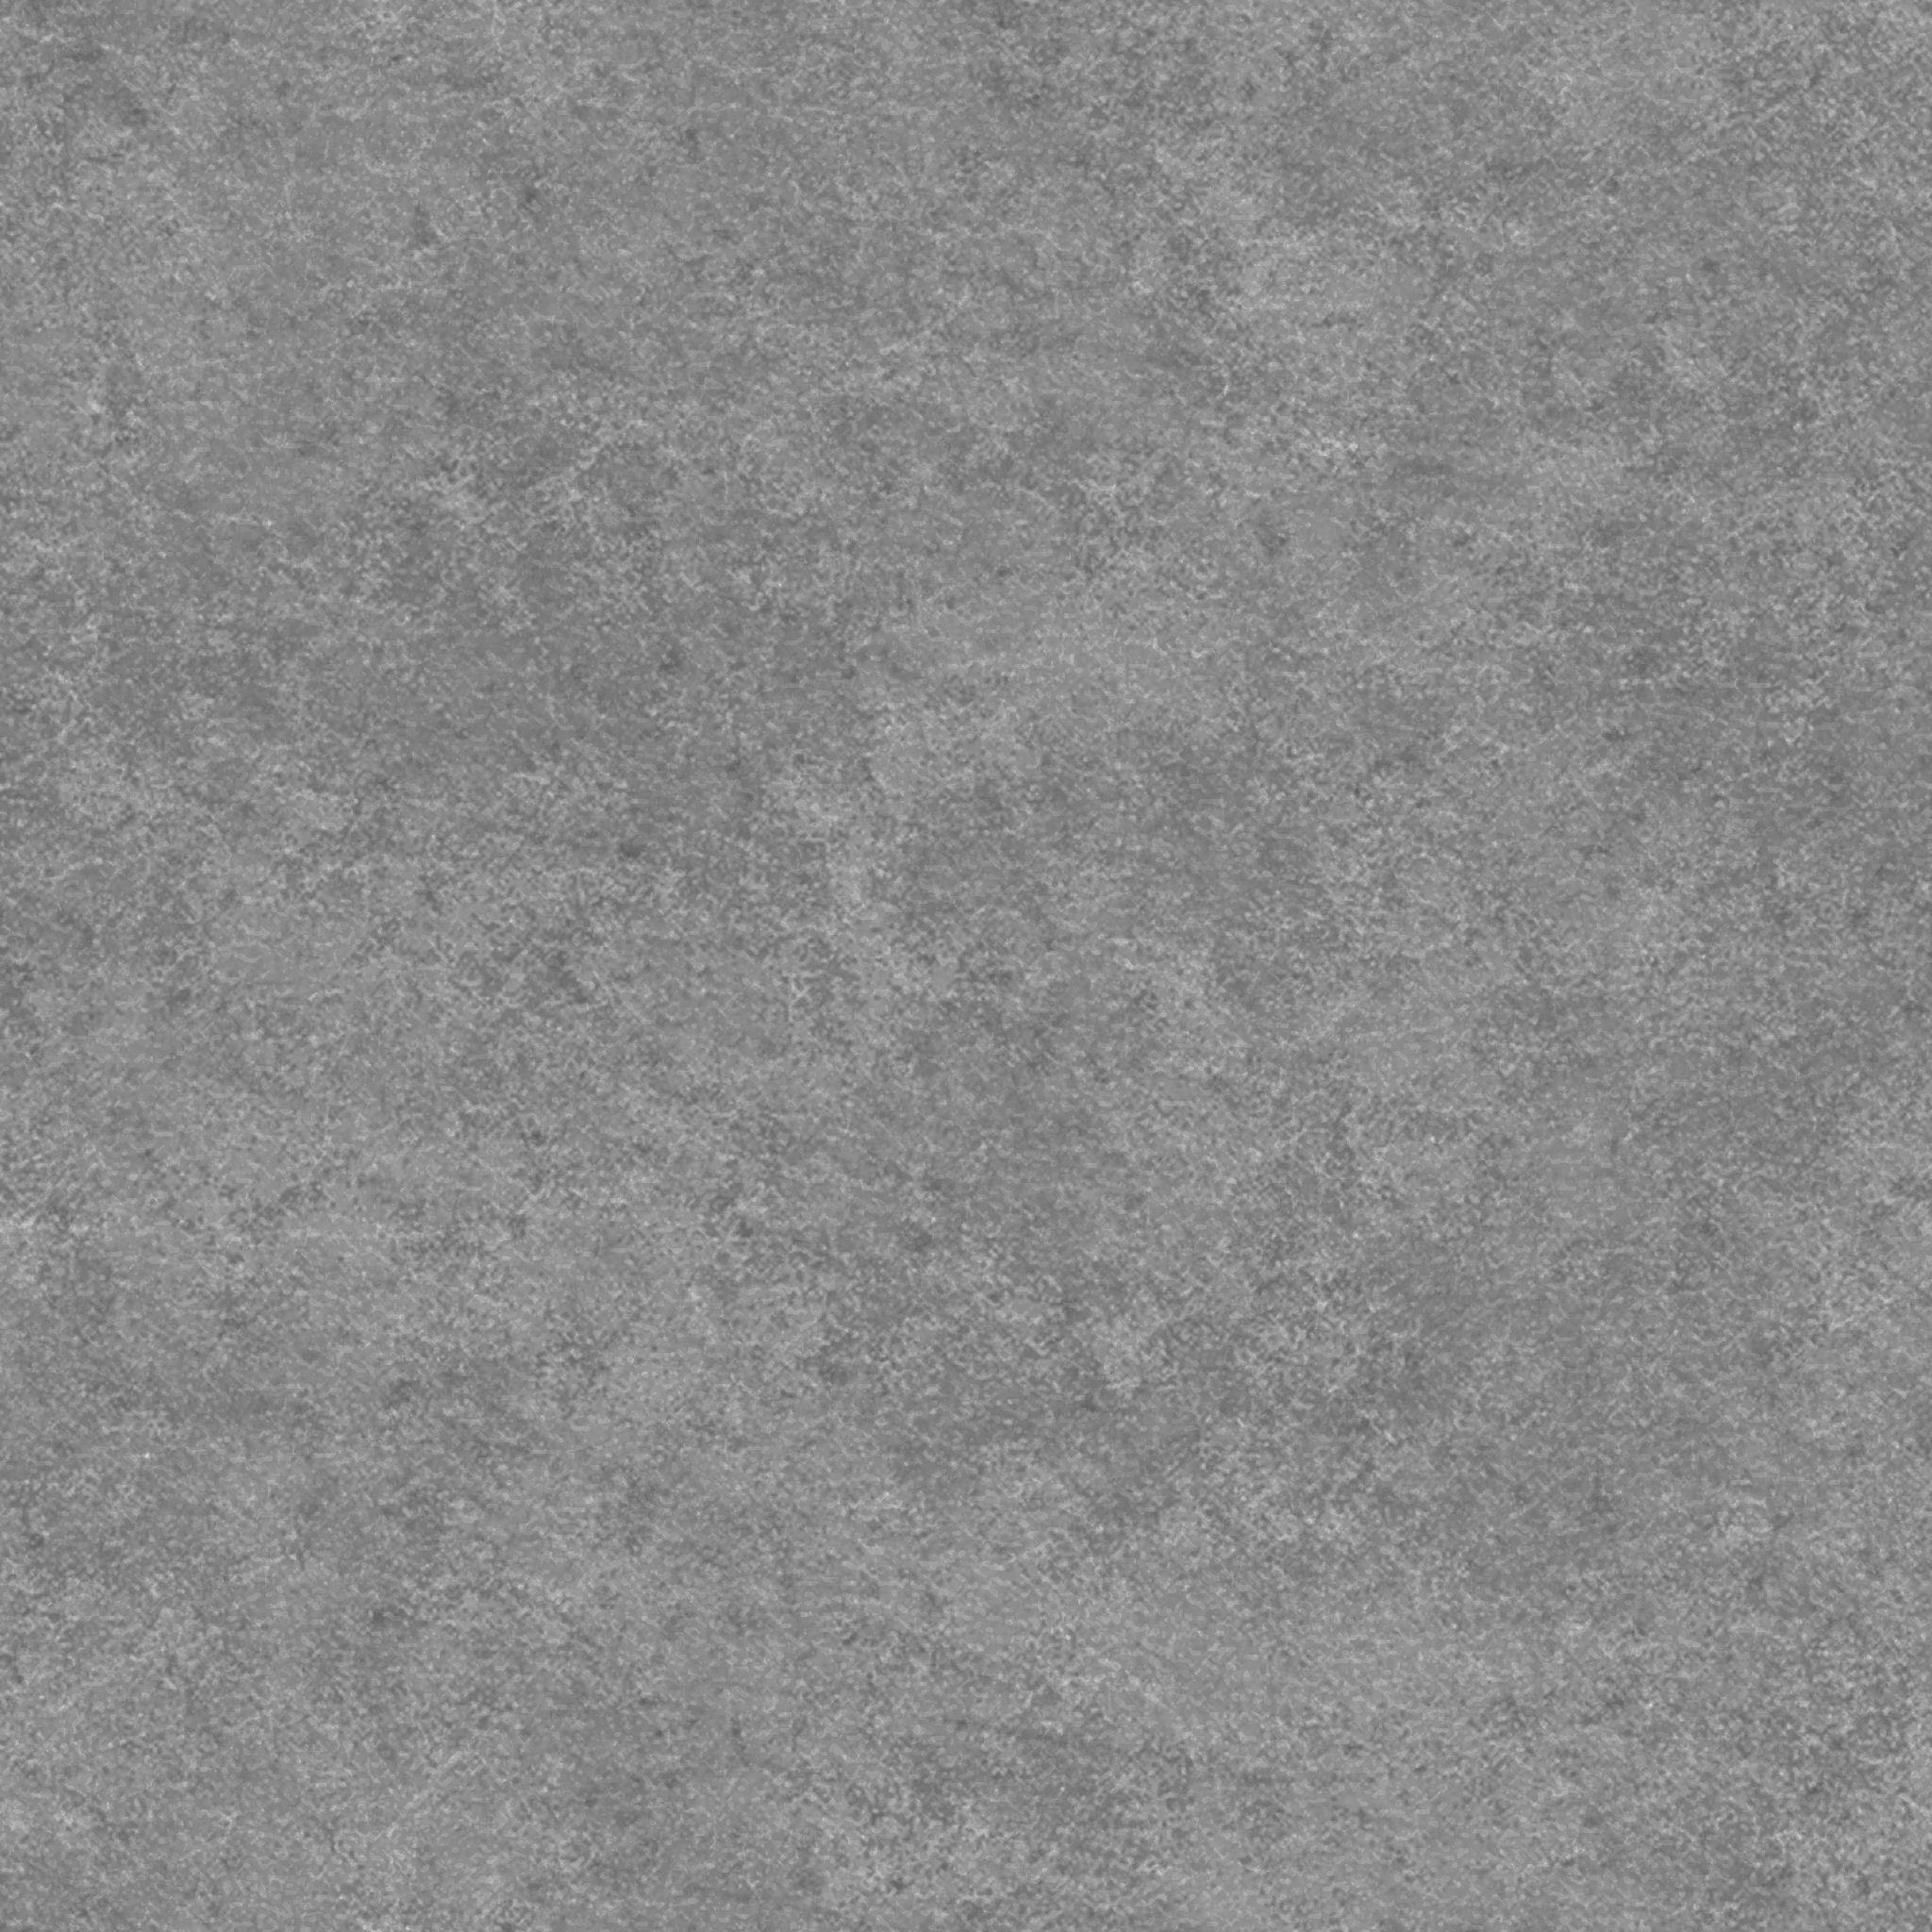 Concrete Floor Texture Seamless Design Decor Ideas